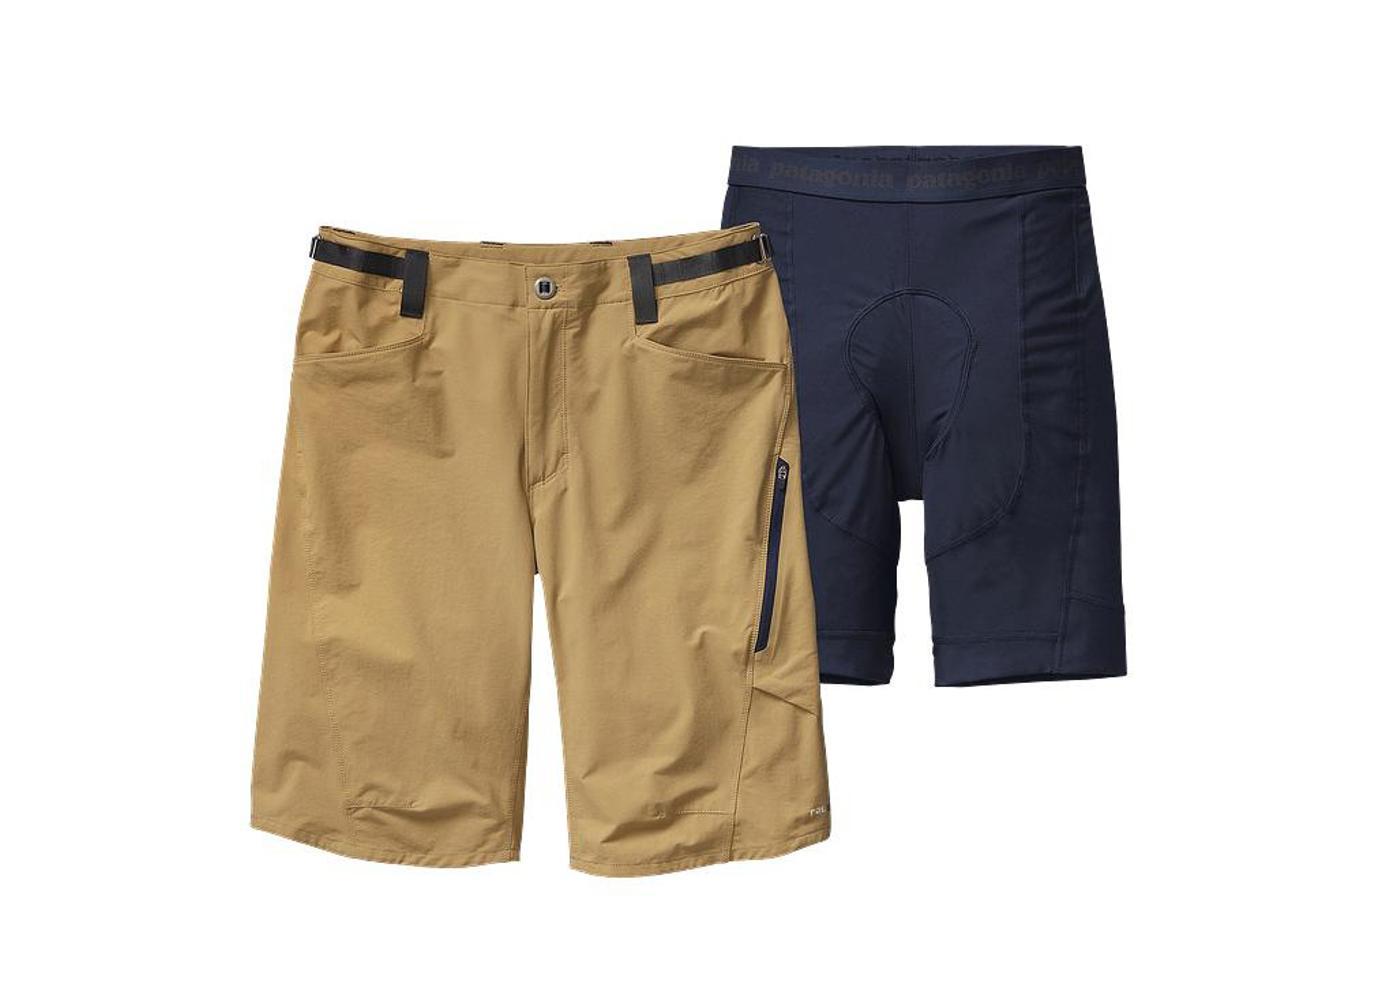 Patagonia's Dirt Craft MTB Shorts